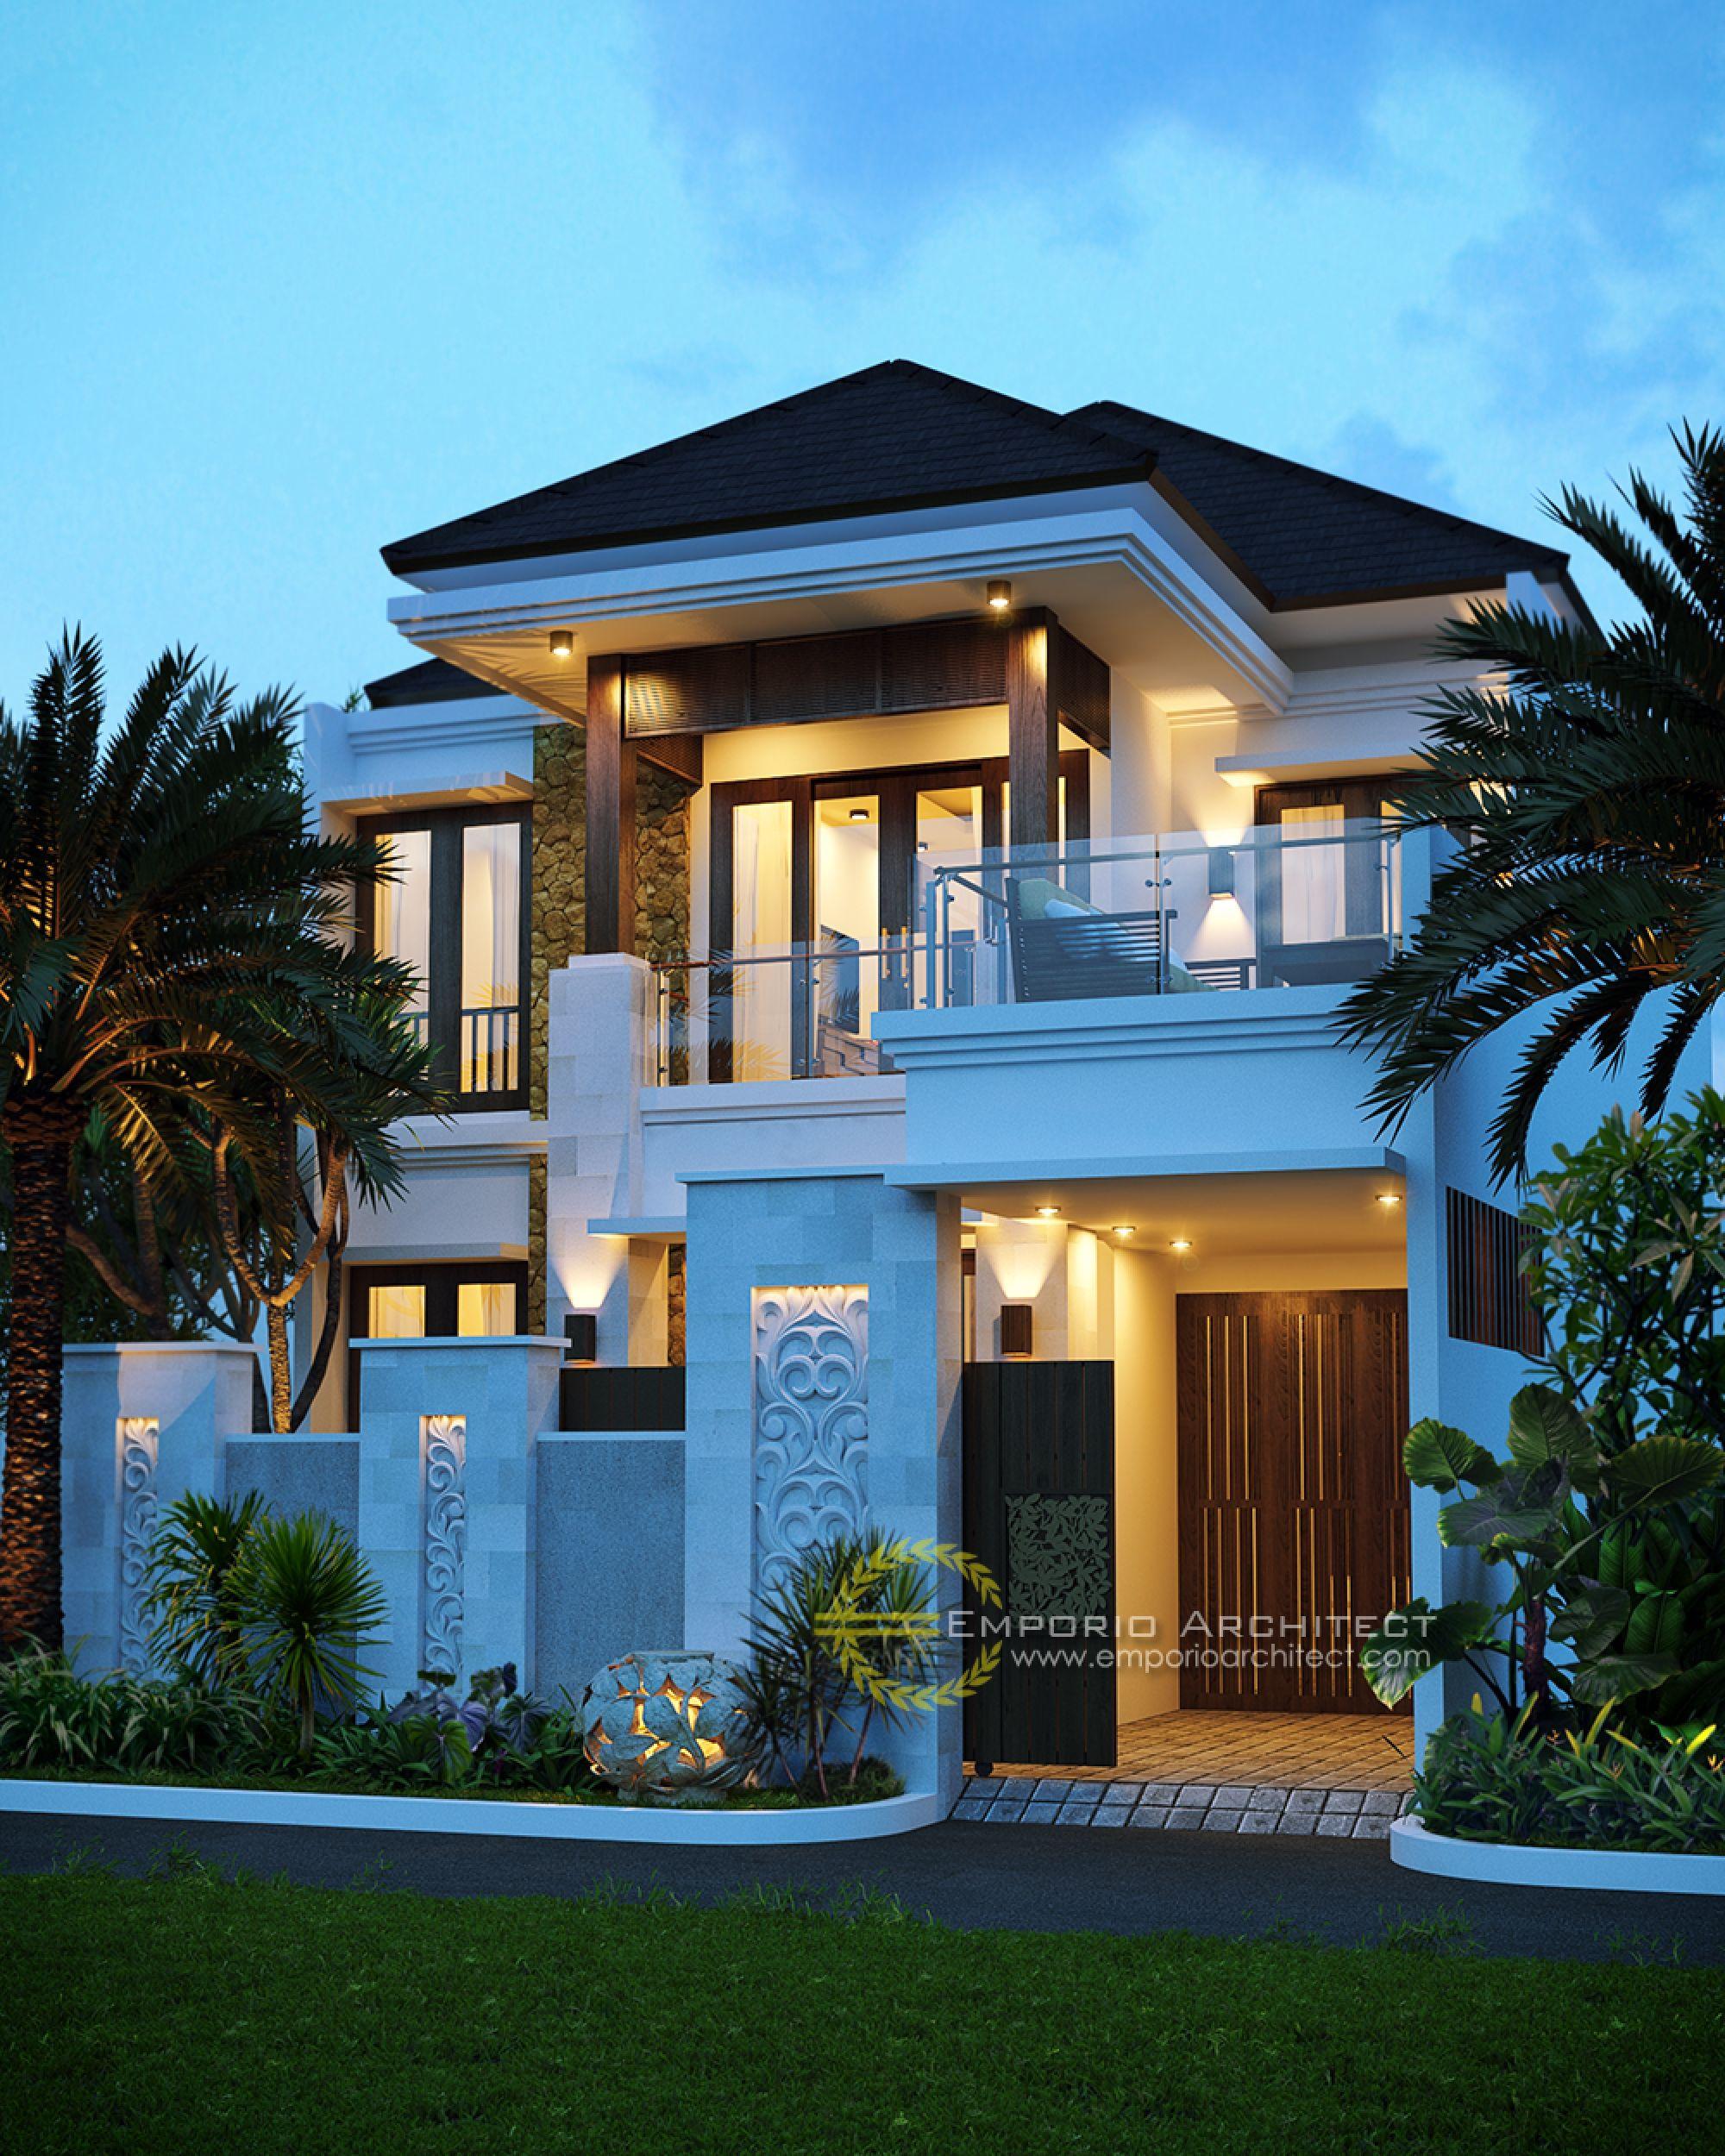 Jasa Arsitek Desain Rumah Bapak Arvey | EXTERIOR | Pinterest ...